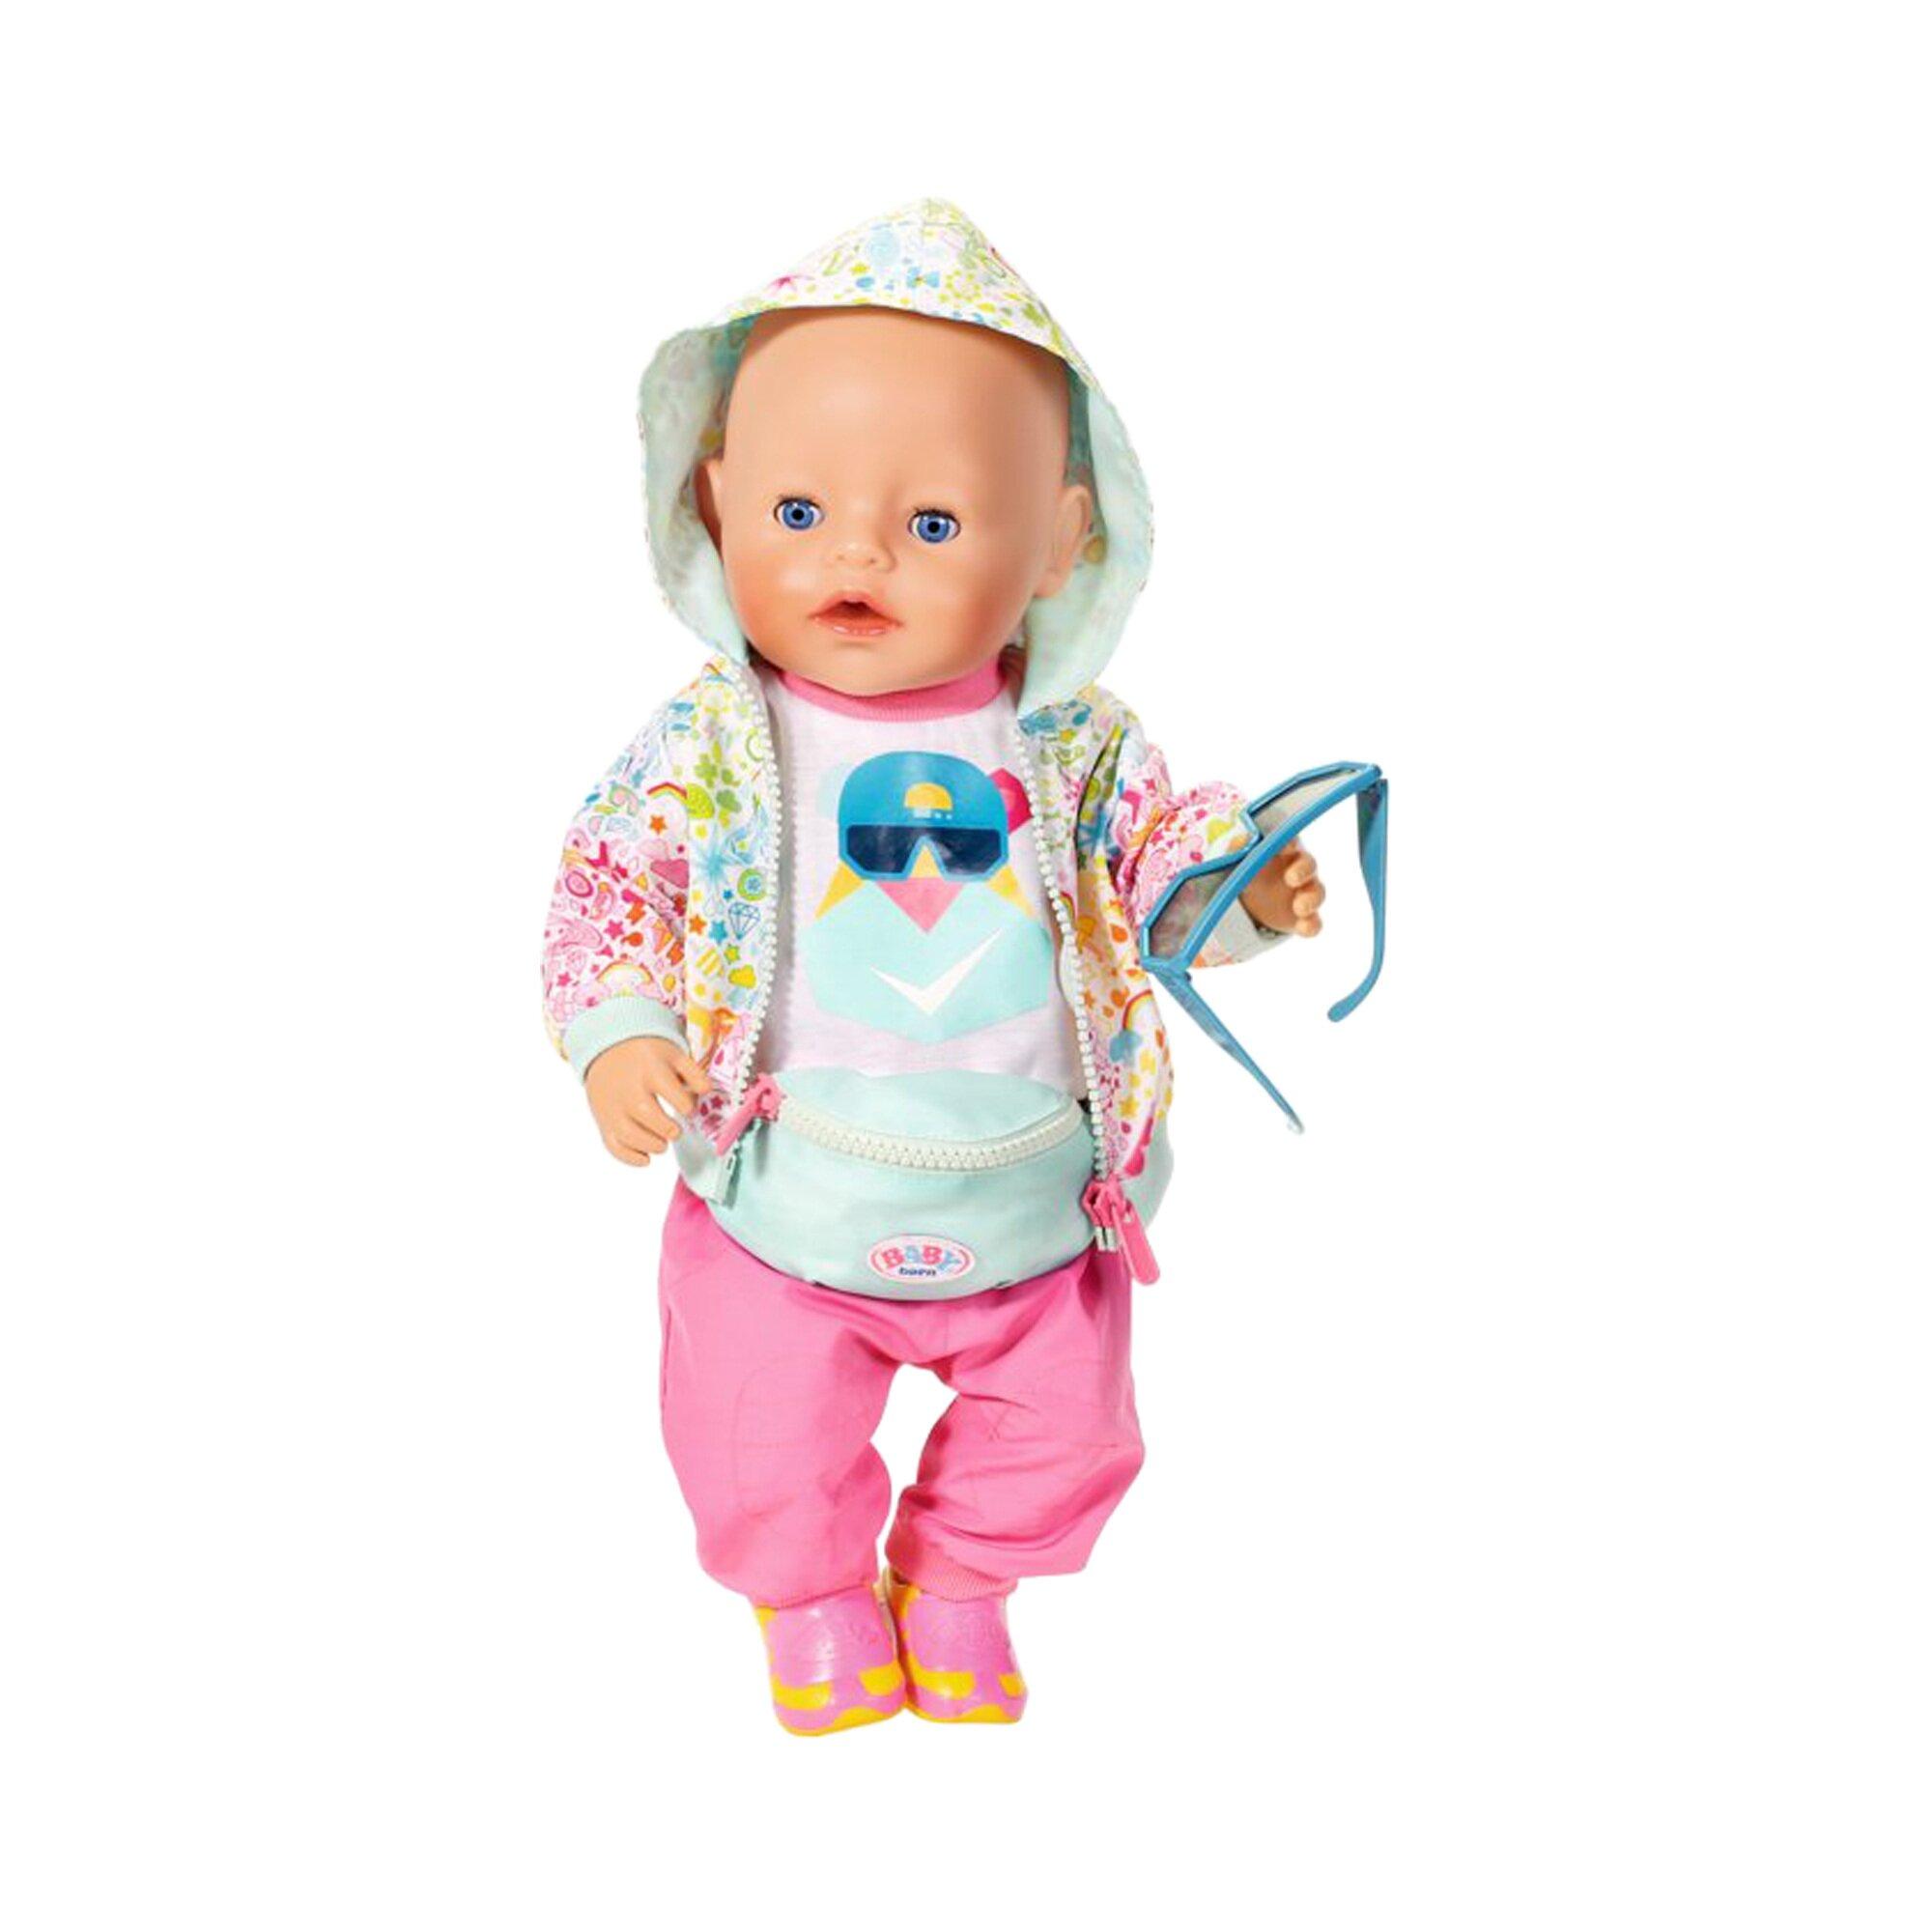 baby-born-baby-born-play-fun-deluxe-fahrrad-outfit